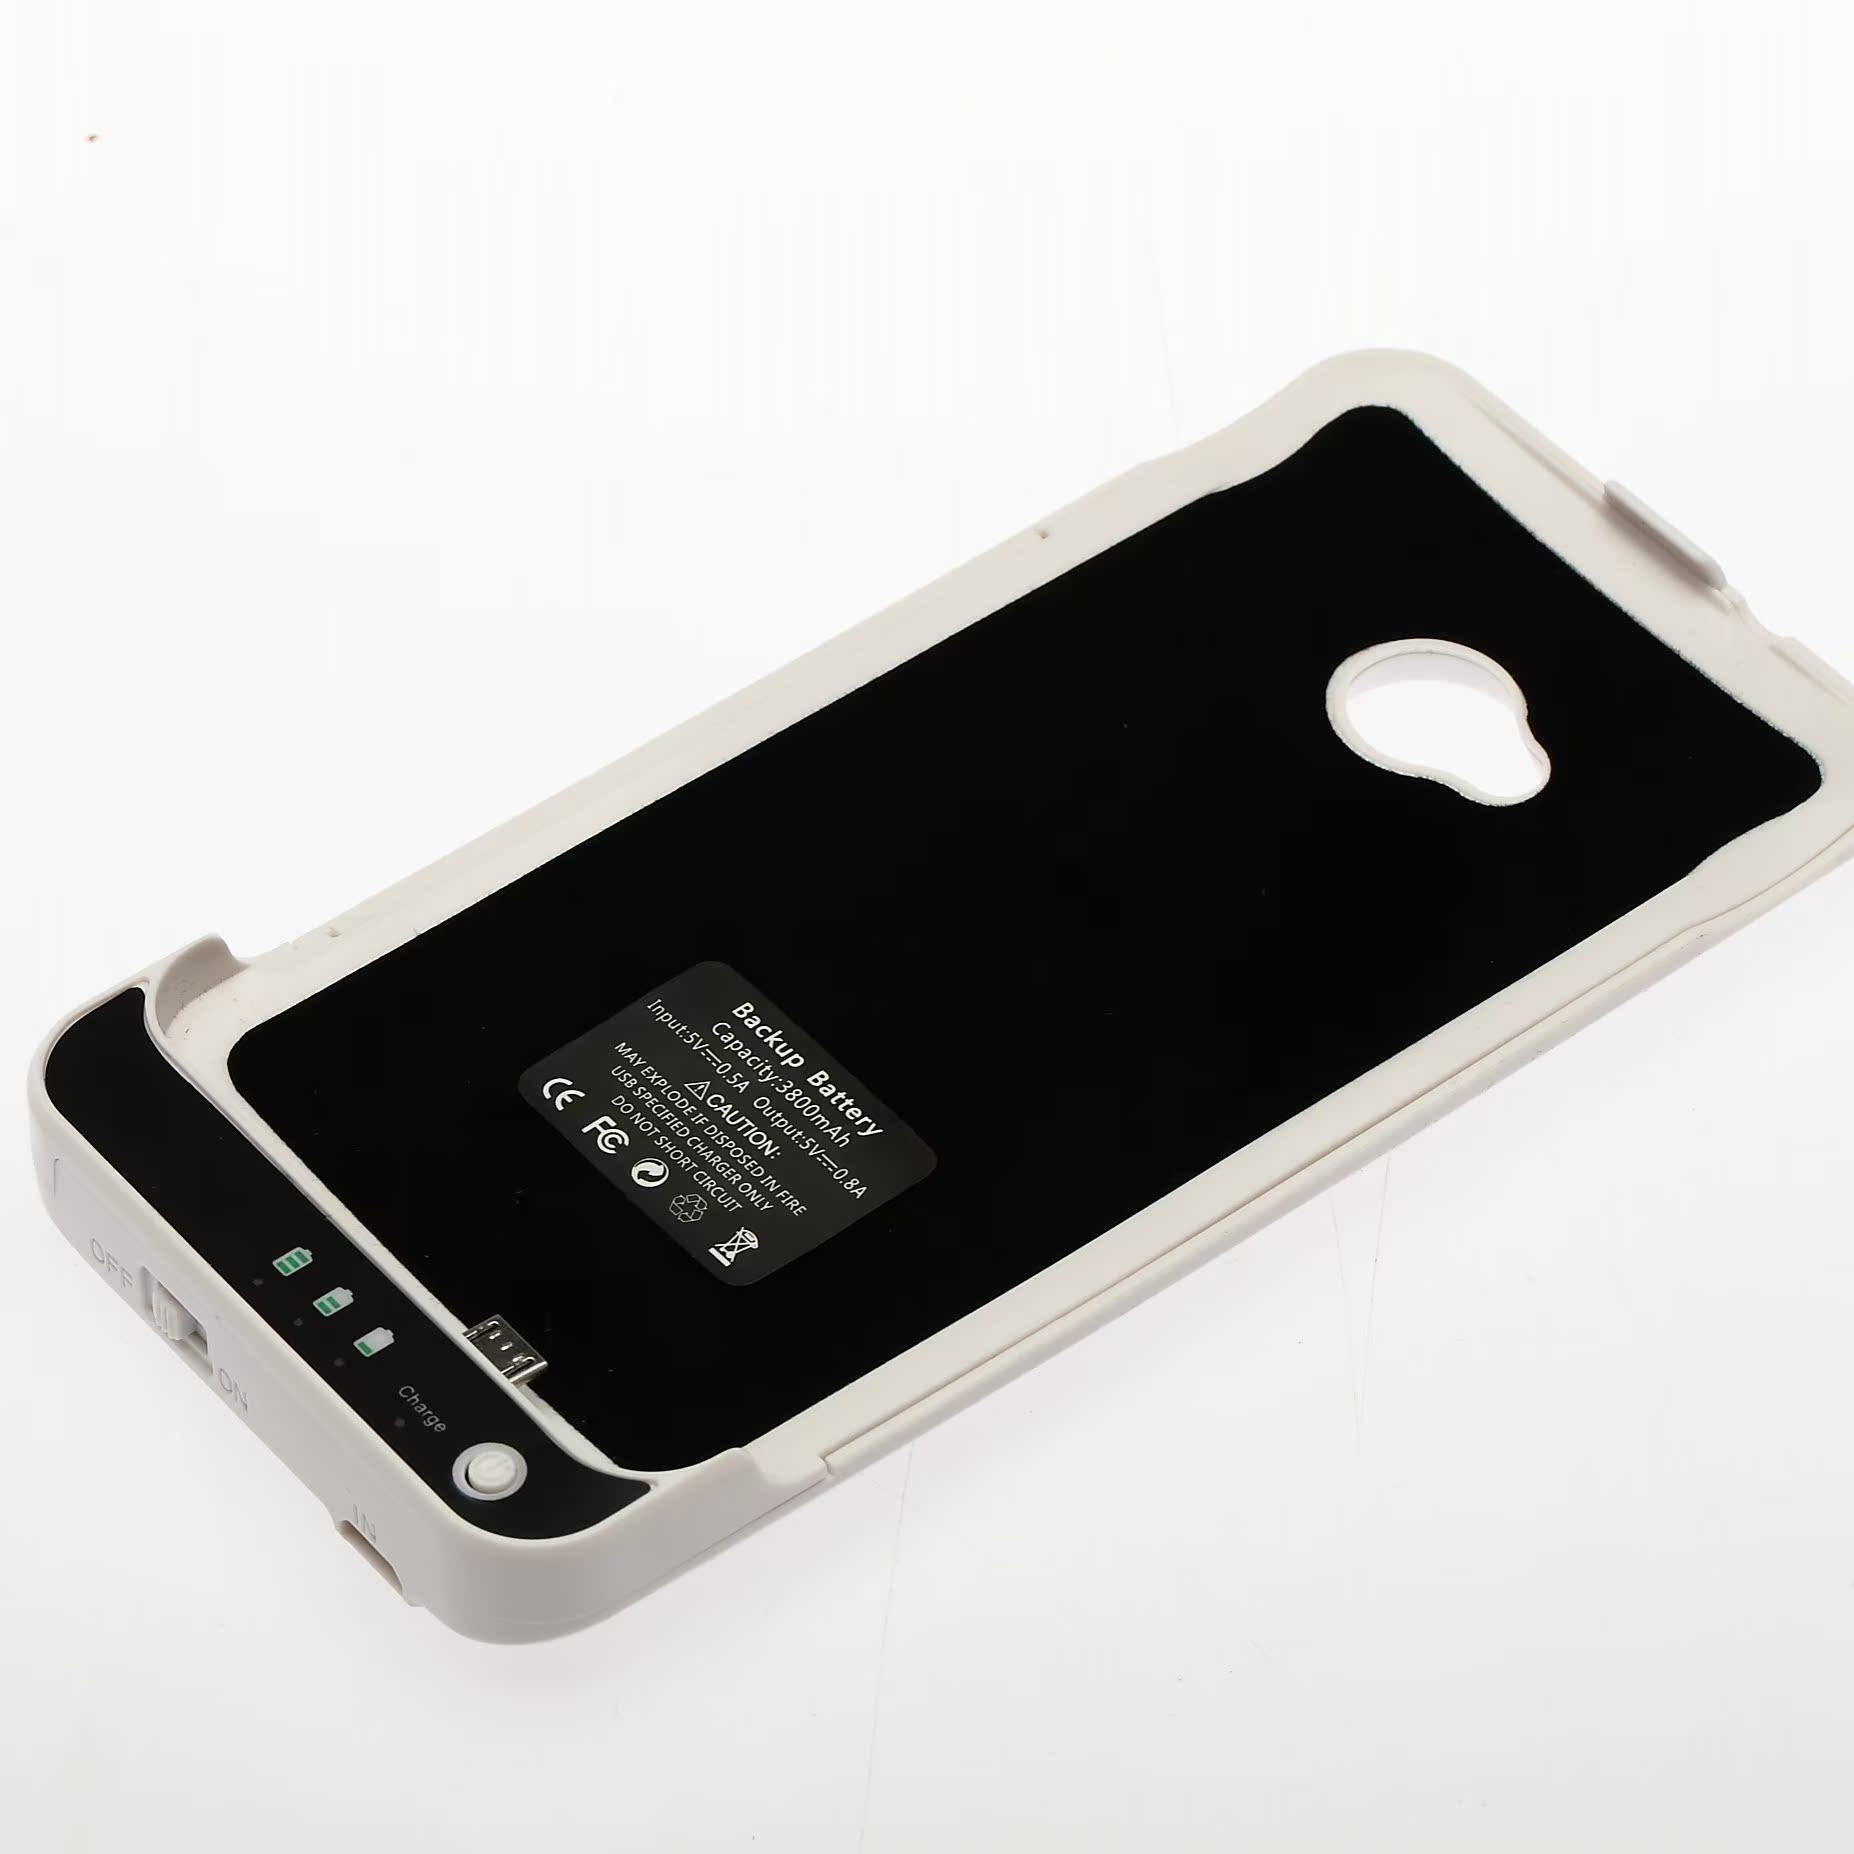 htc 802t手机套_正品HTC ONE M7背夹电池 802W手机移动电源802T\D充电宝保护壳套